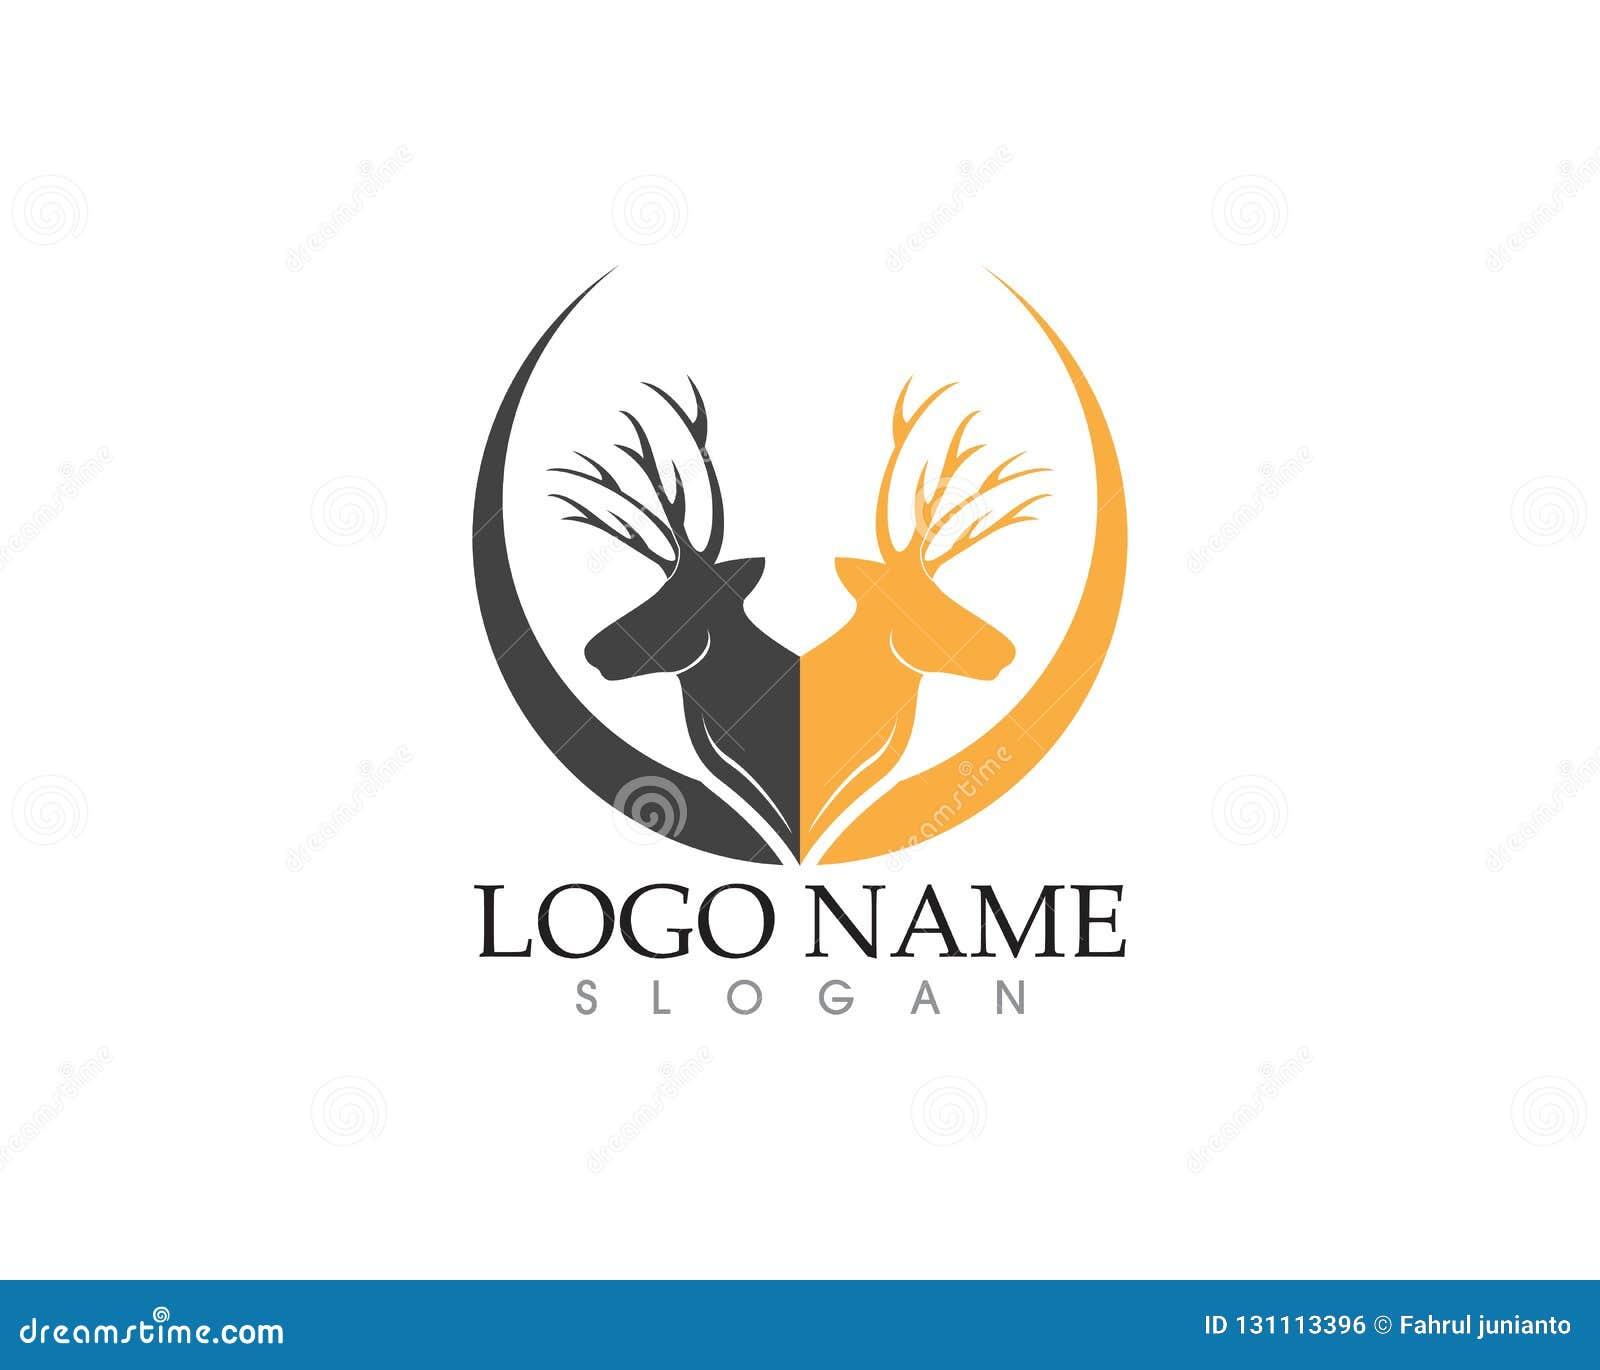 Deer Head Silhouette Logo Vector Stock Vector - Illustration of